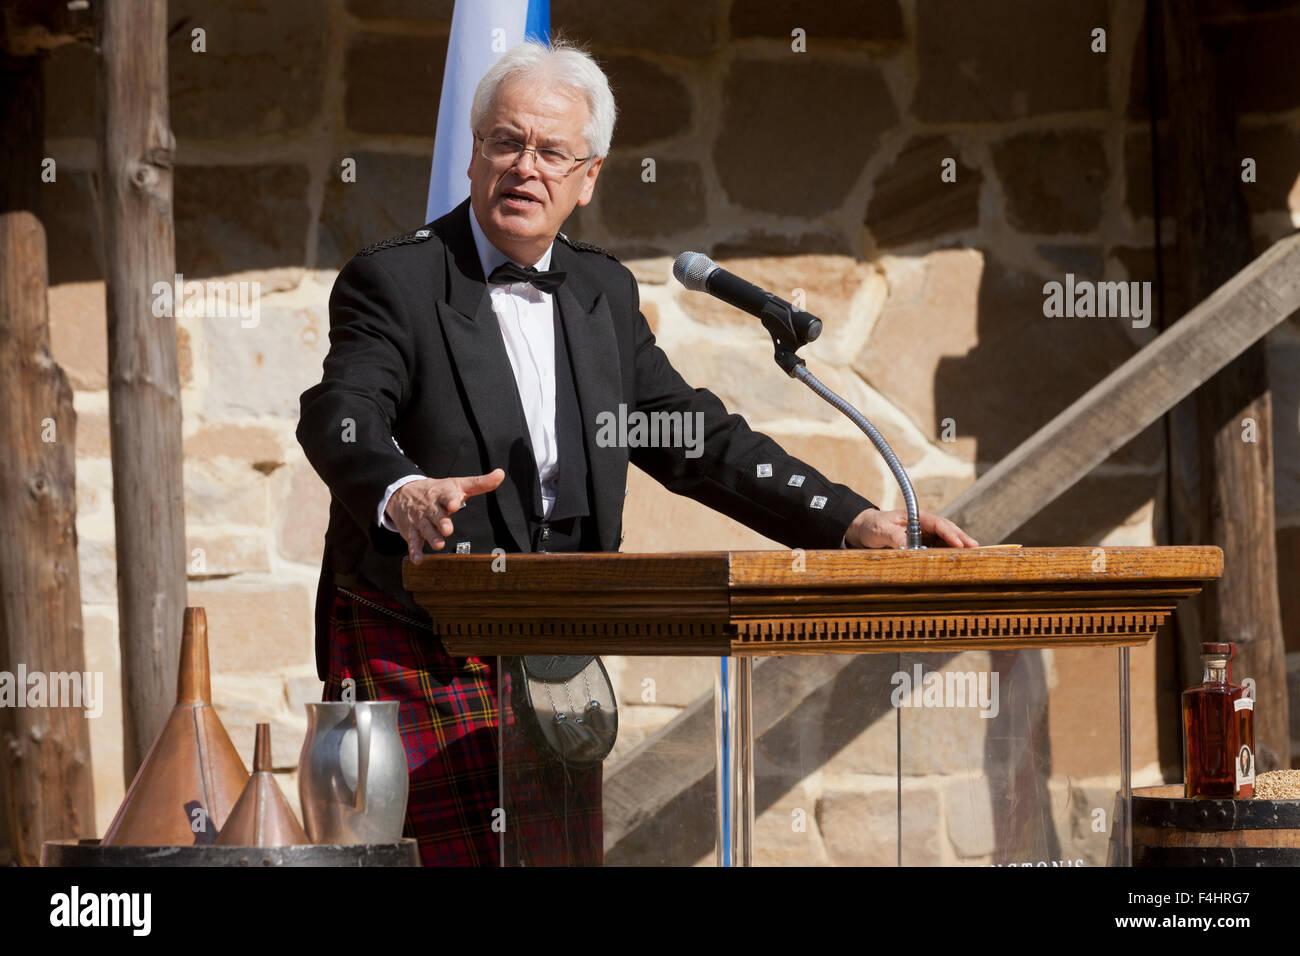 Andy Cant, whisky distiller, speaking at  George Washington's Distillery Single Malt Whisky - Alexandria, Virginia - Stock Image